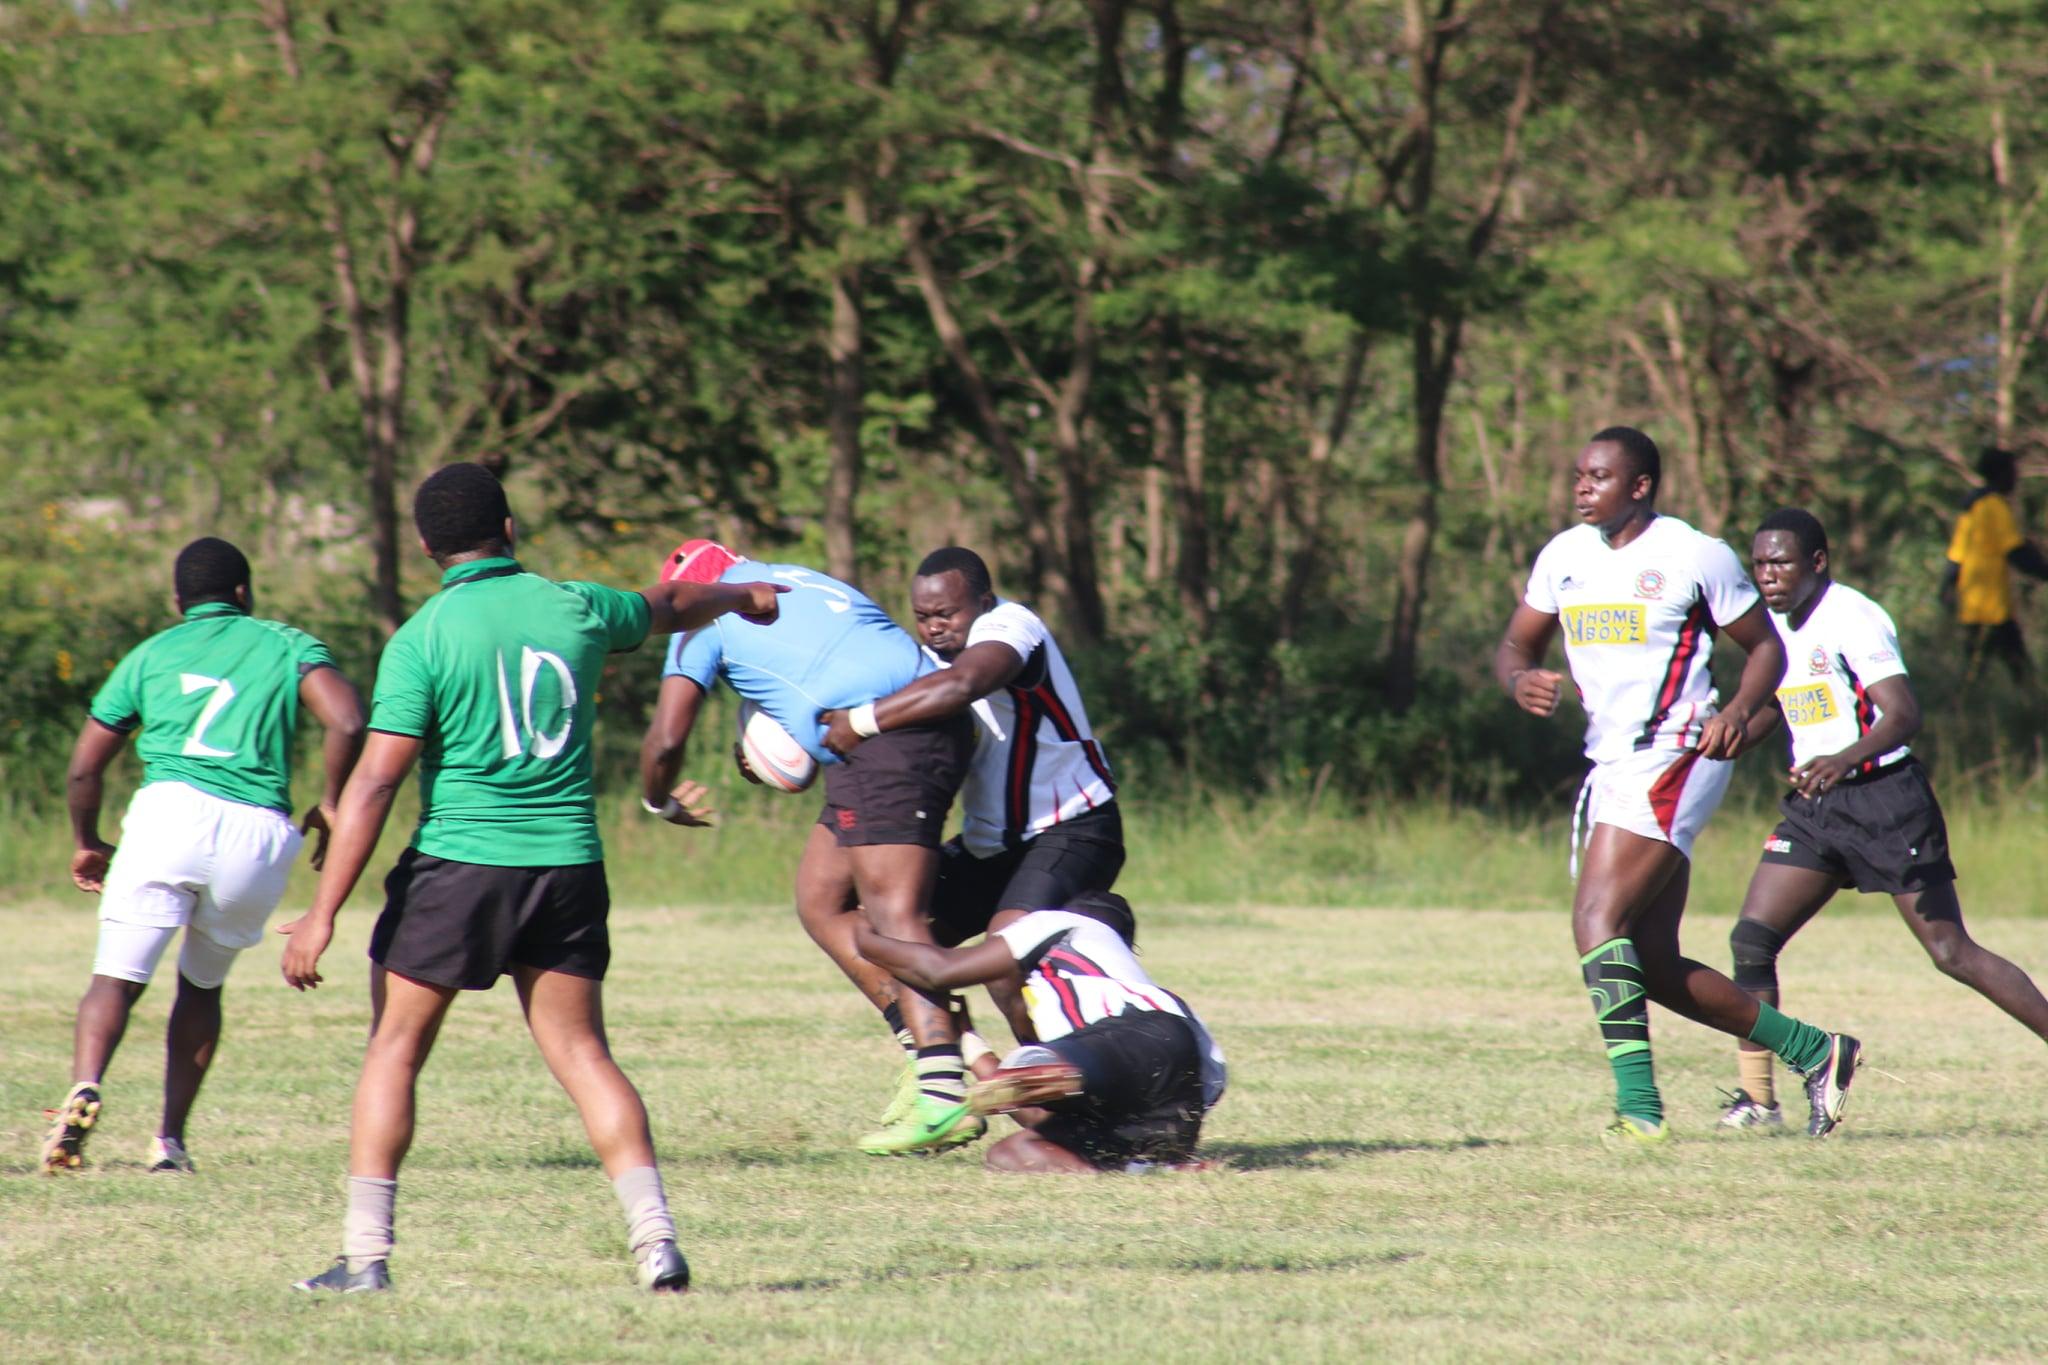 JKUAT rugby